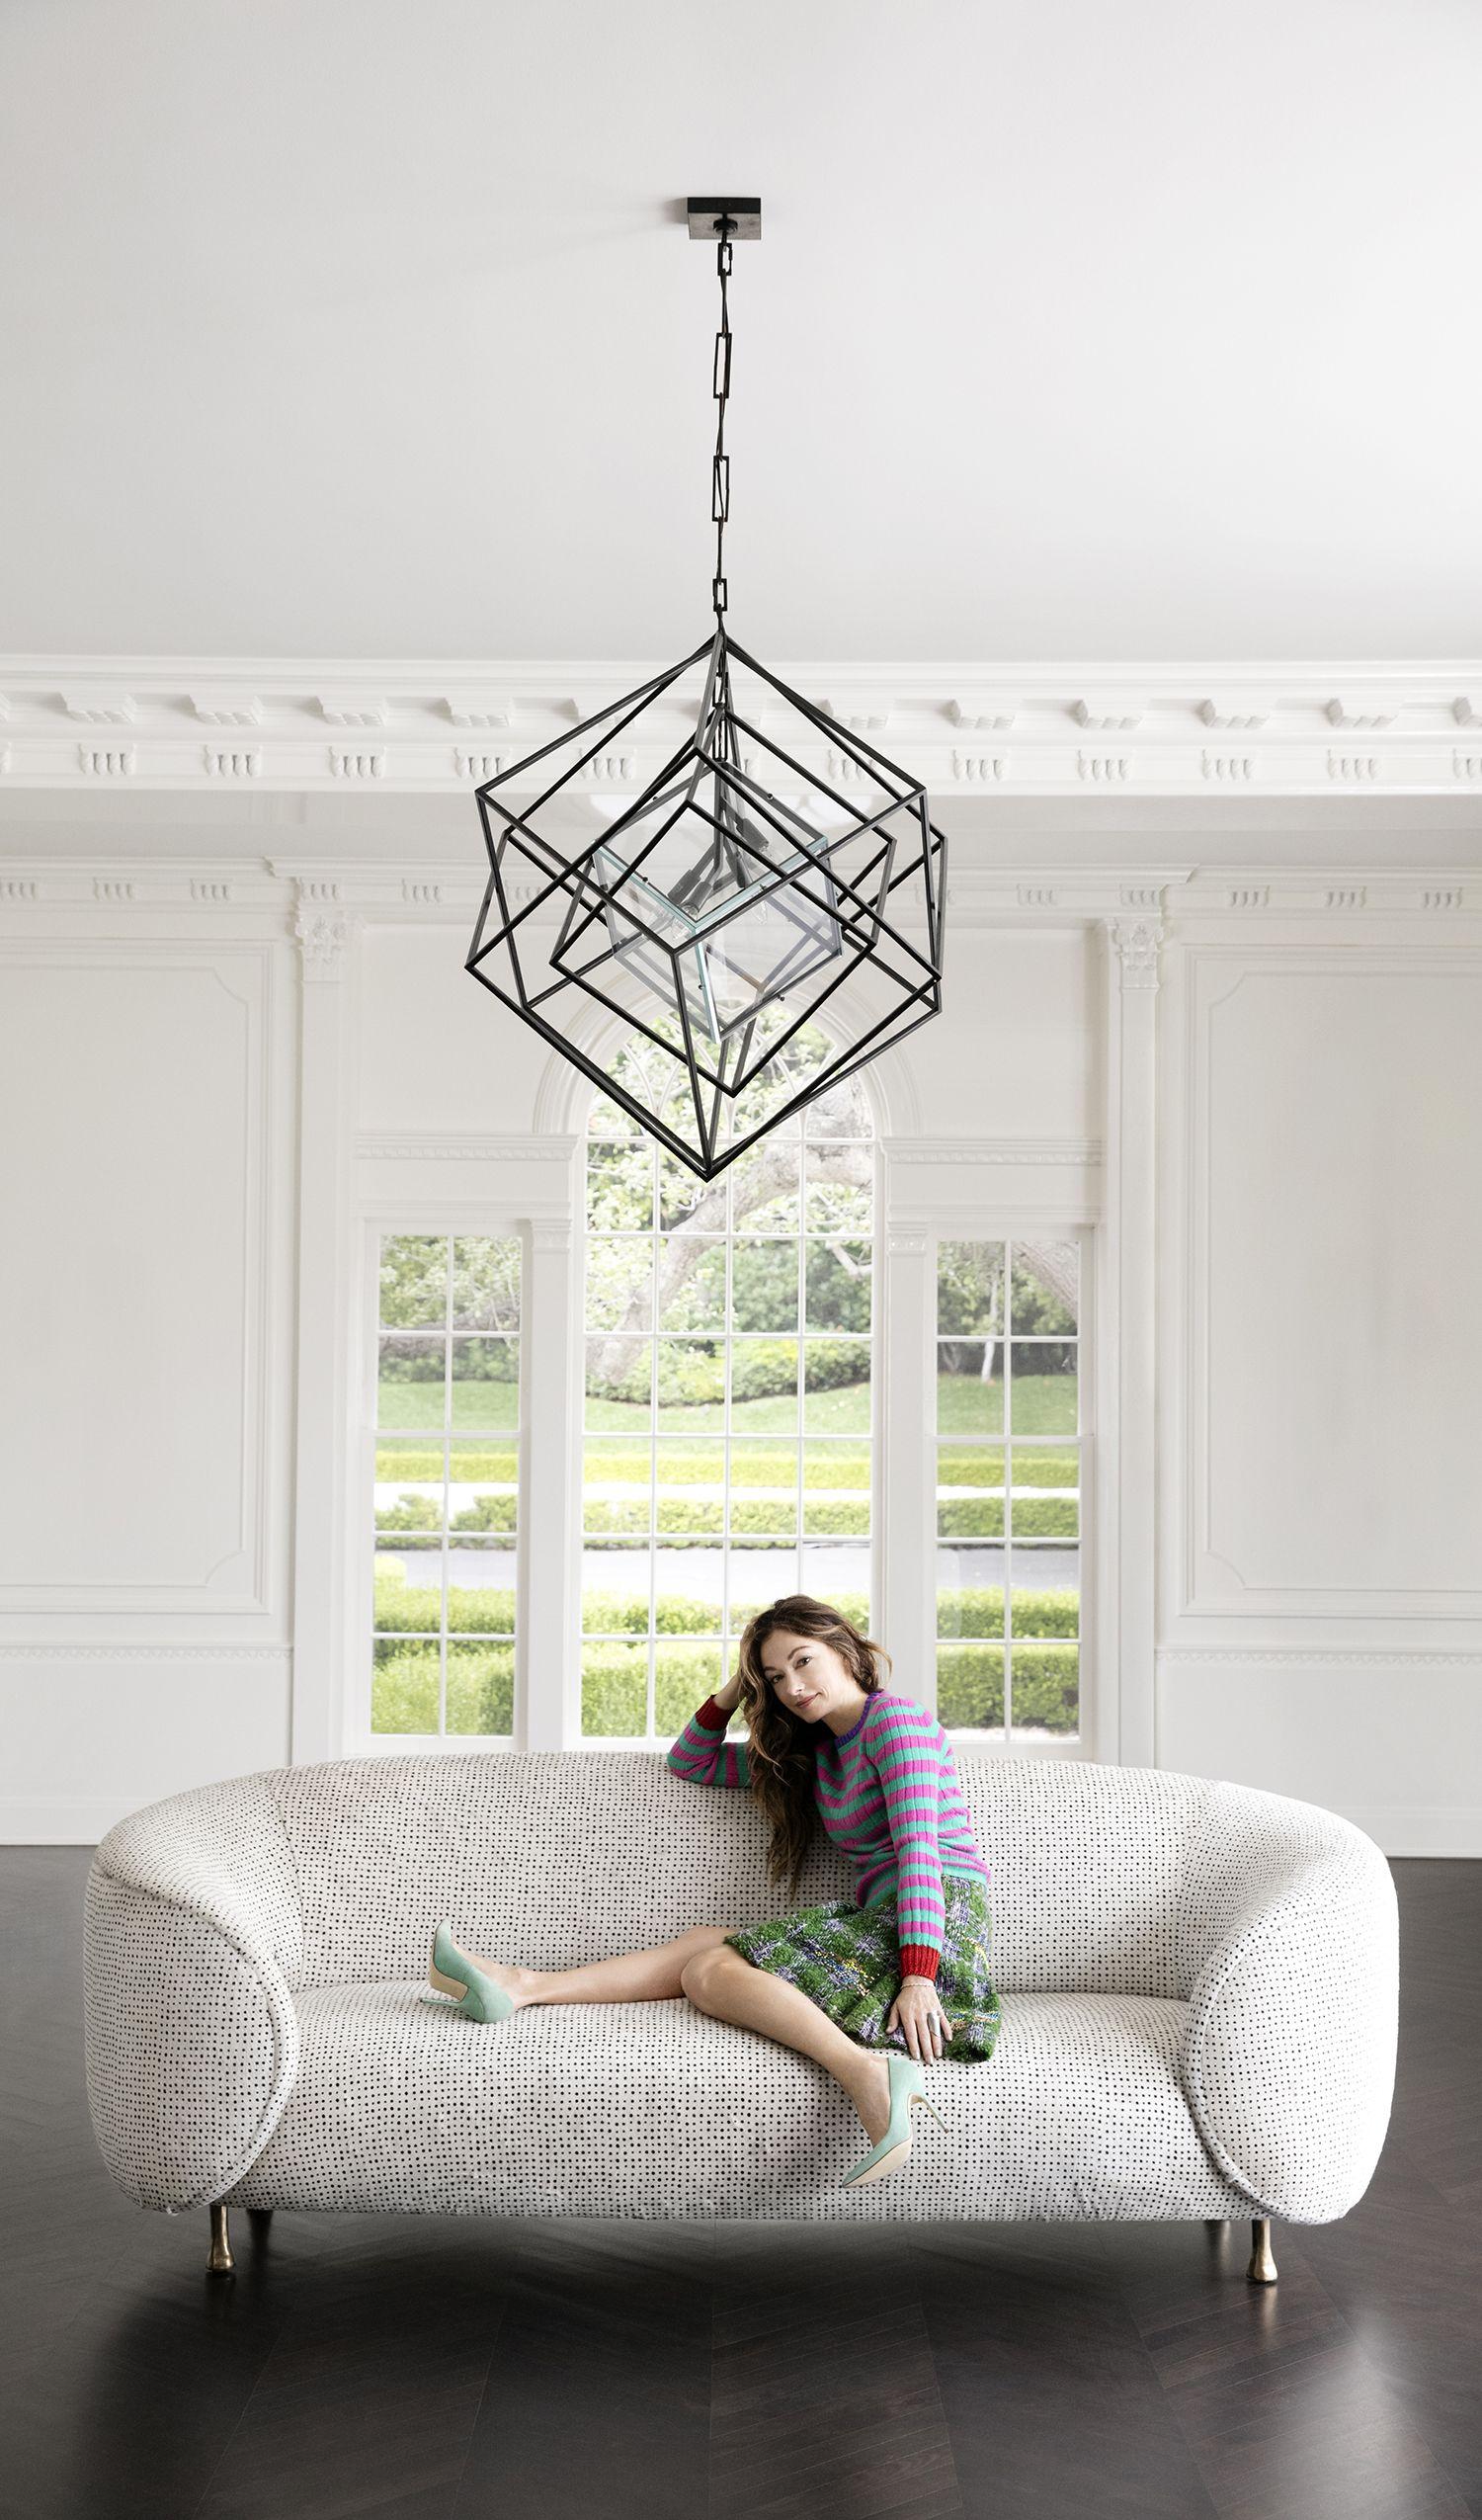 Magnificent Cubist Large Chandelier In 2019 High Ceiling Living Room Spiritservingveterans Wood Chair Design Ideas Spiritservingveteransorg